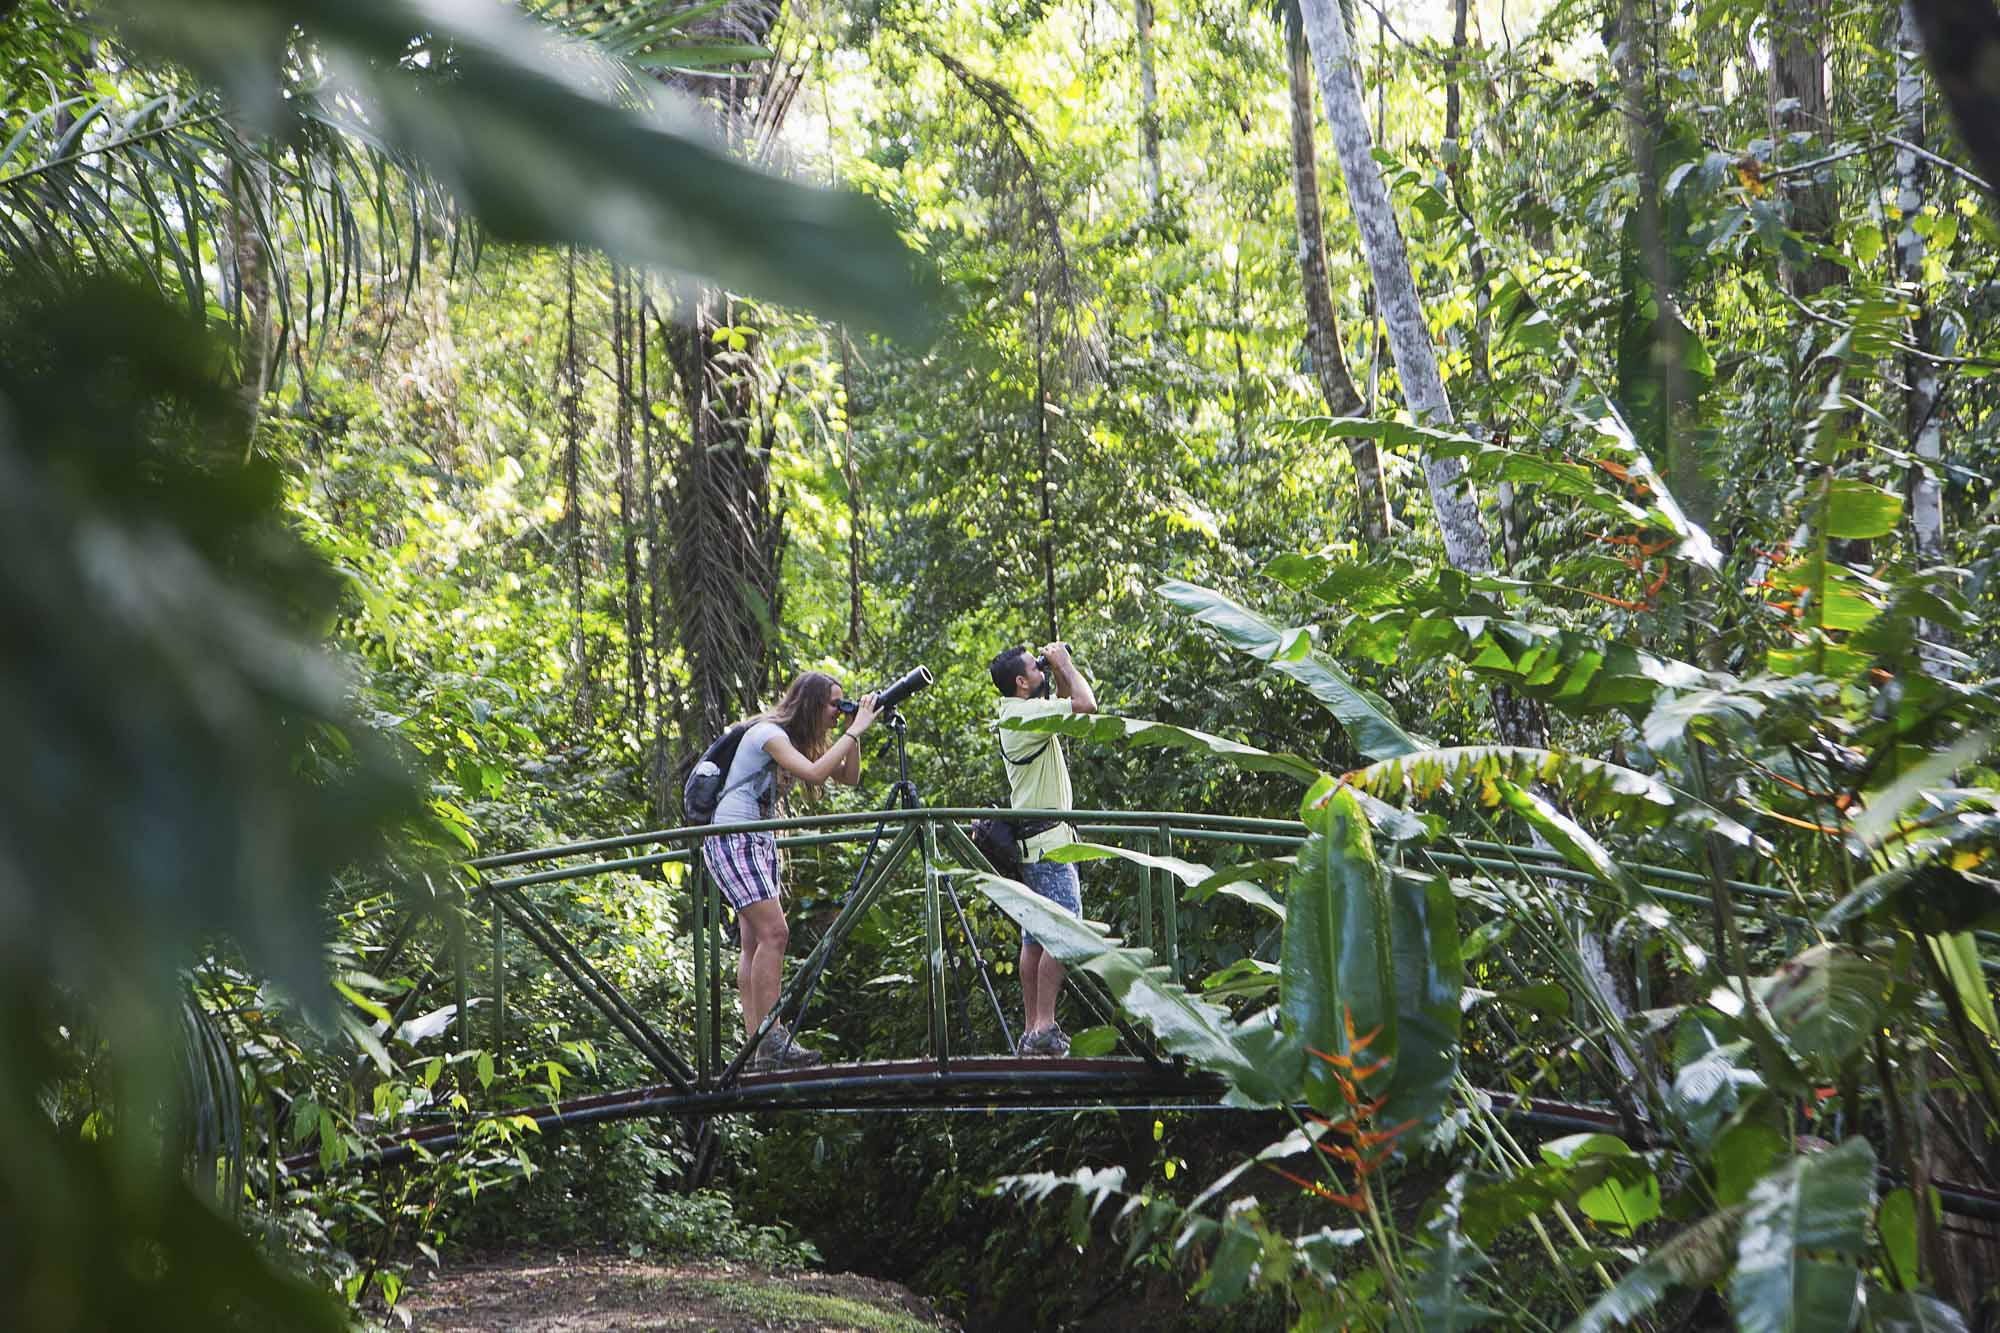 Costa Rica, Peninsula de Osa, Osa Peninsula, Danta Corcovado Lodge, Naturreservat, Vogel Beobachtungs-Tour